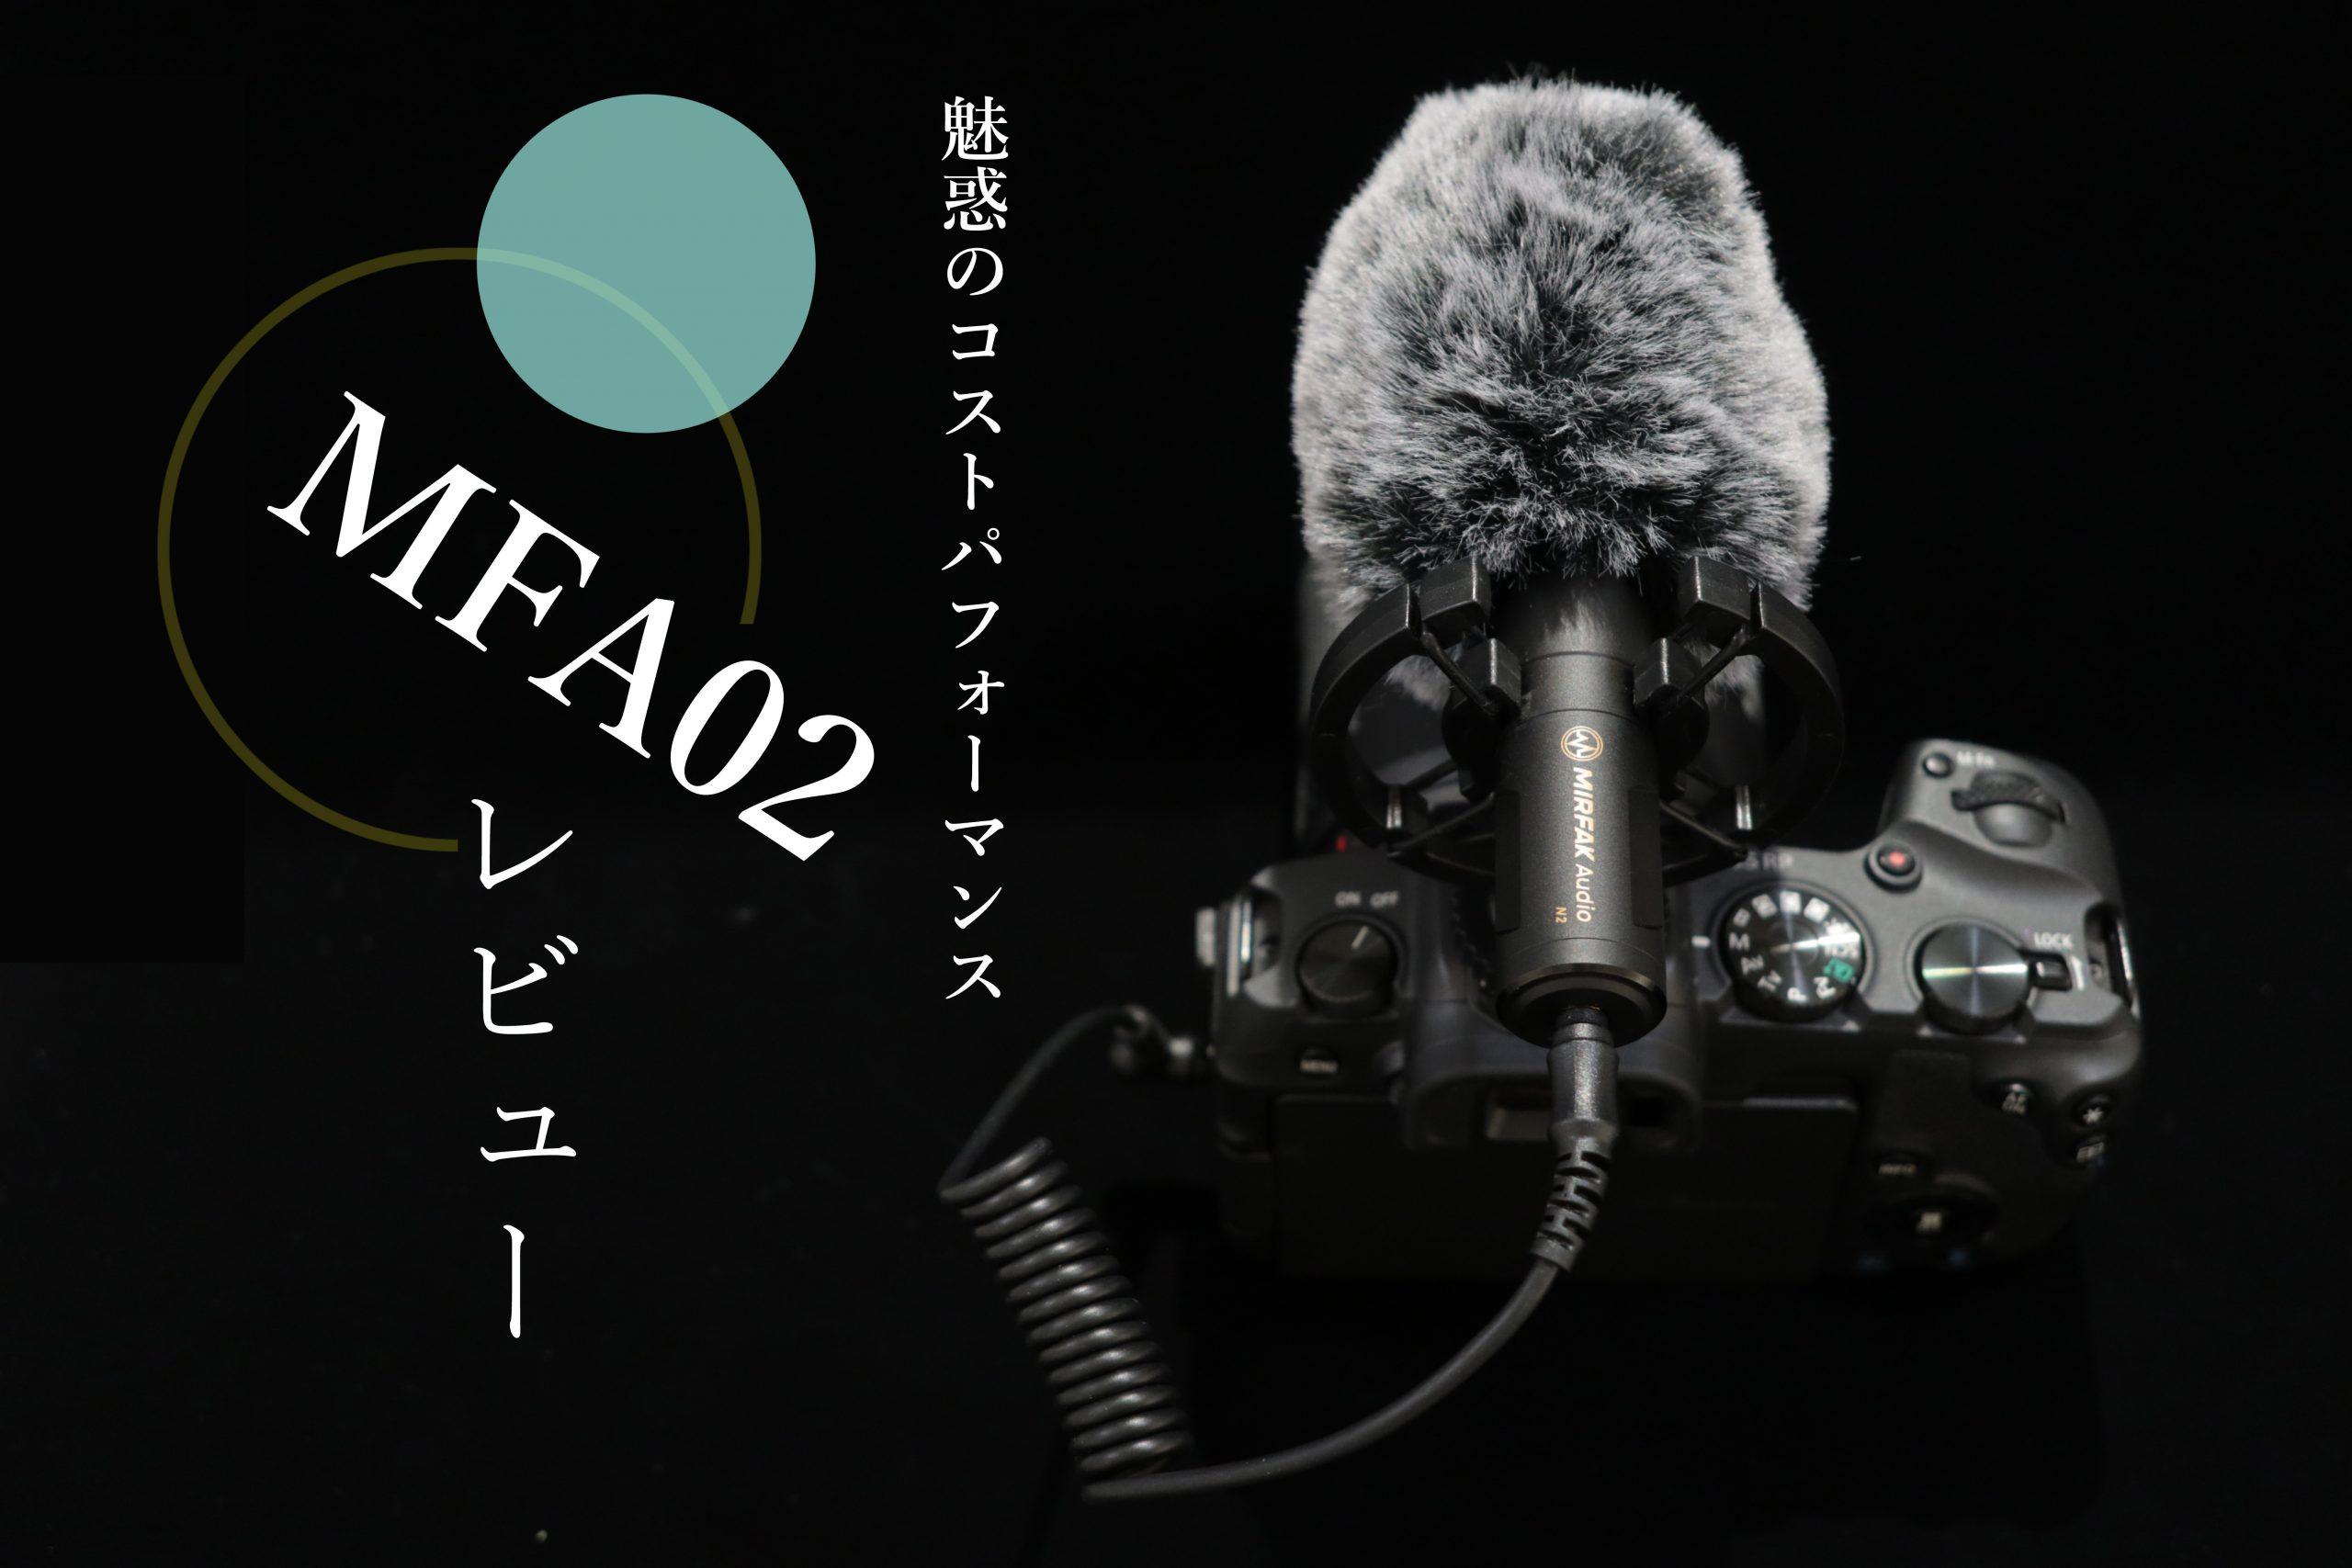 【MIRFAK Audio】新品4000円台前半のショットガンマイク「MFA02」が素晴らしい